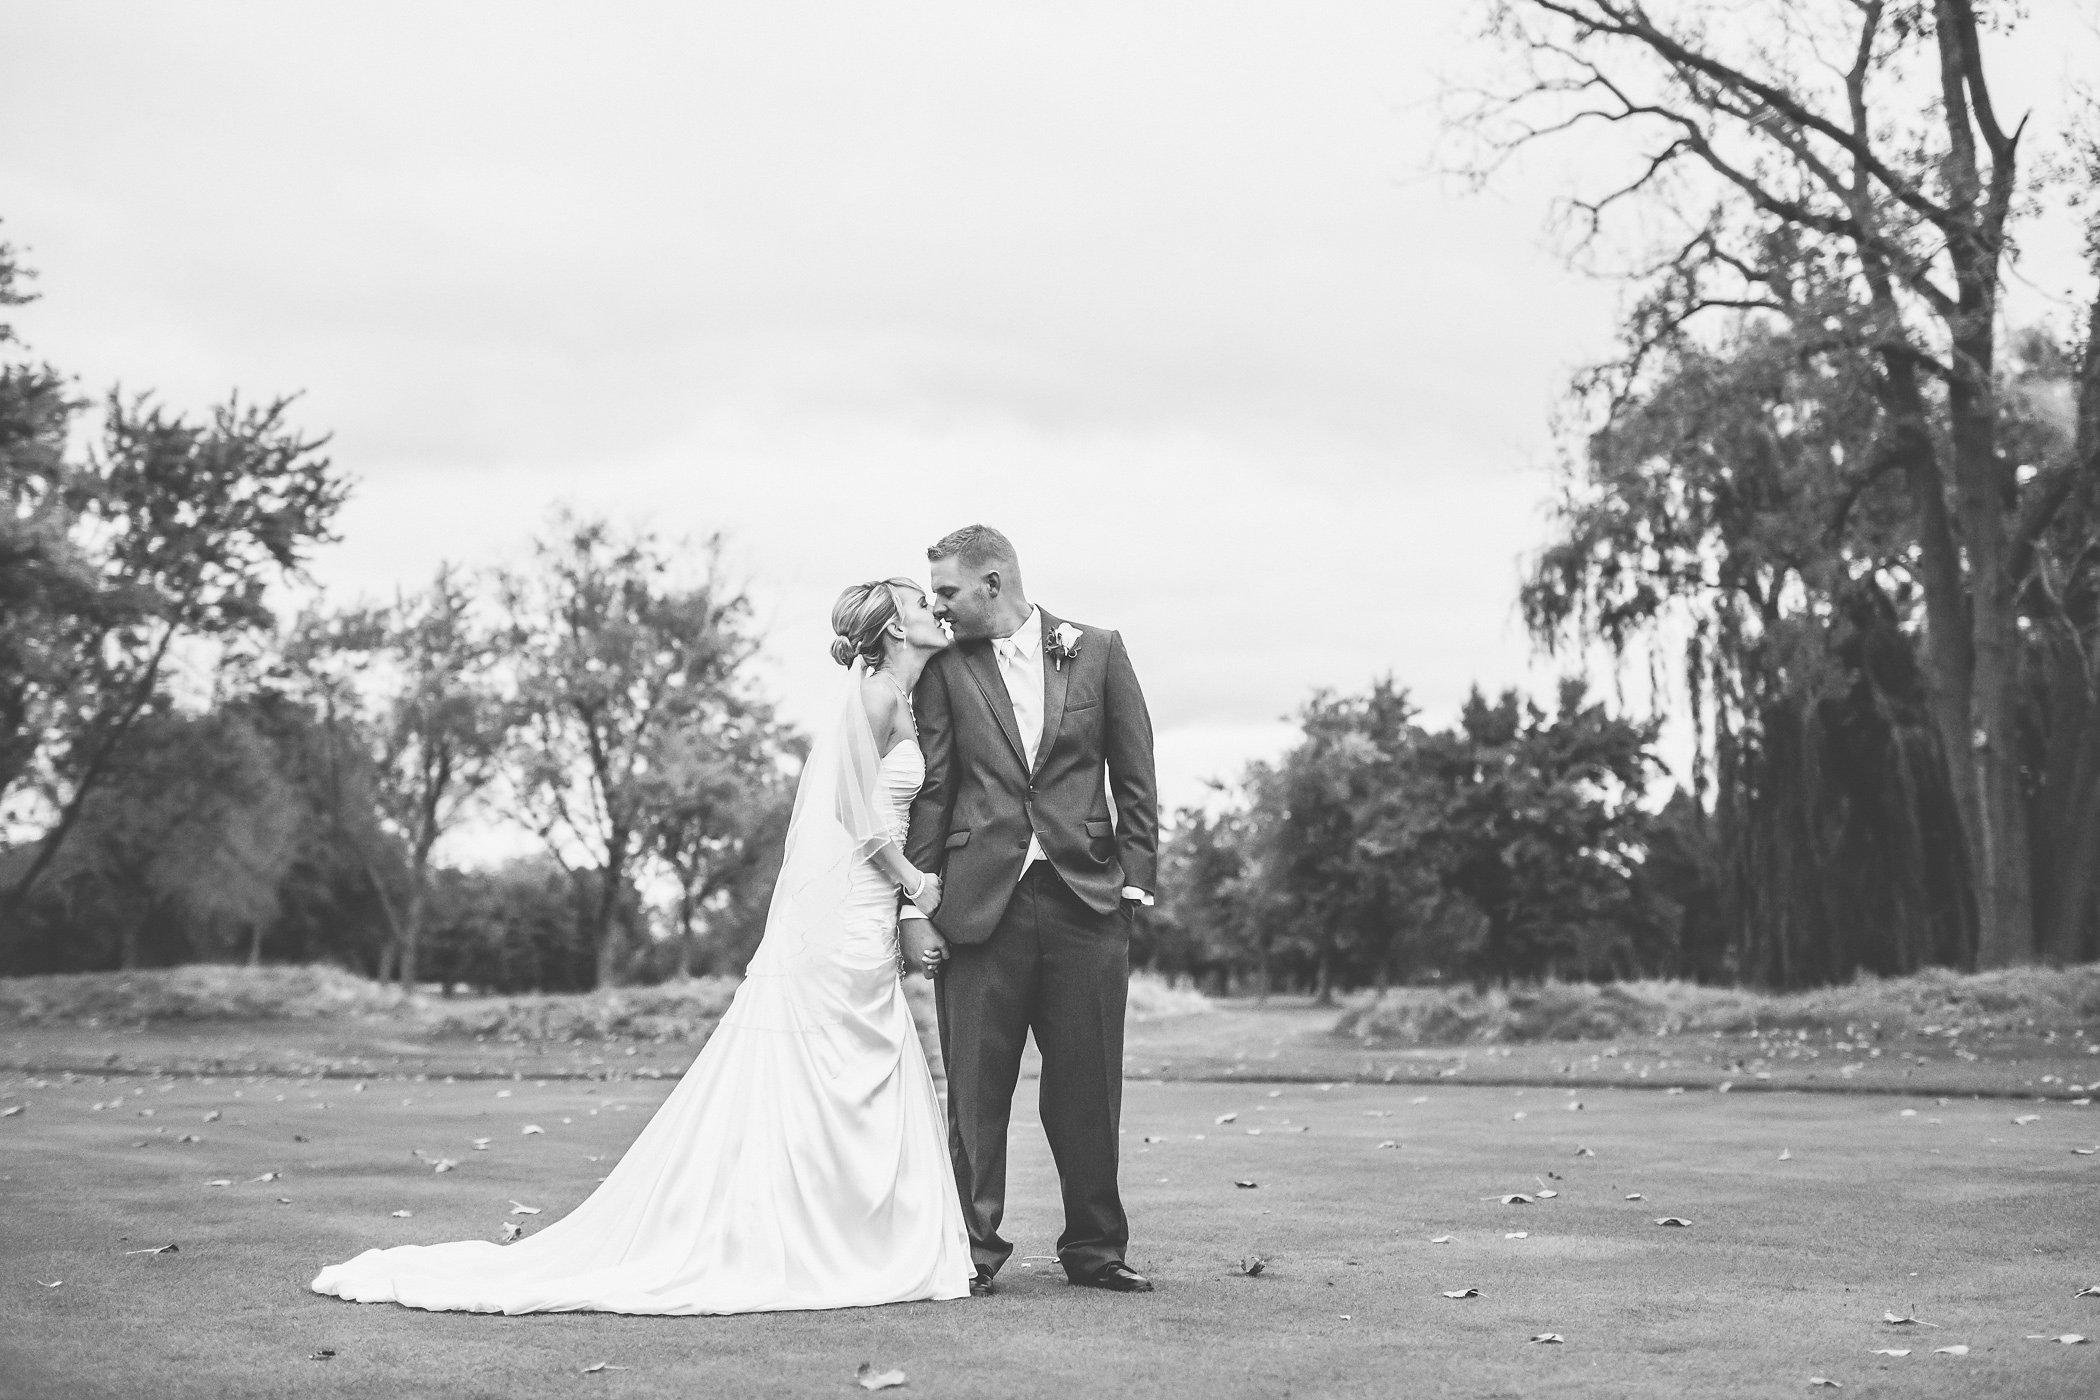 chicago-fine-art-wedding-photography-latasfam